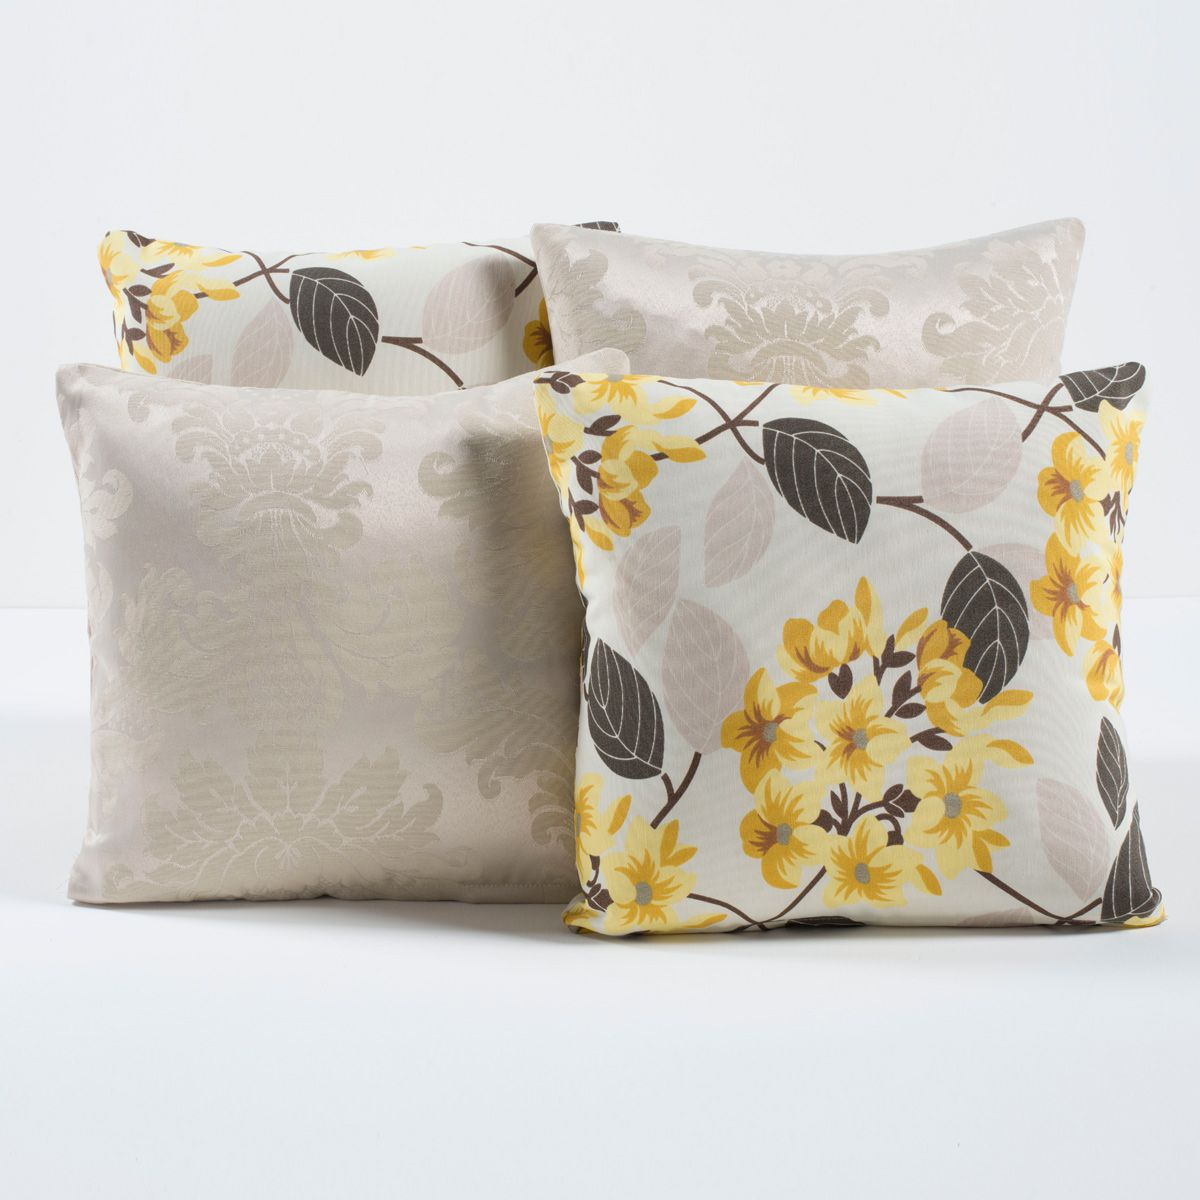 Kit Capas de Almofadas Decorativas Floral Bege/Amarelo 04 Peças